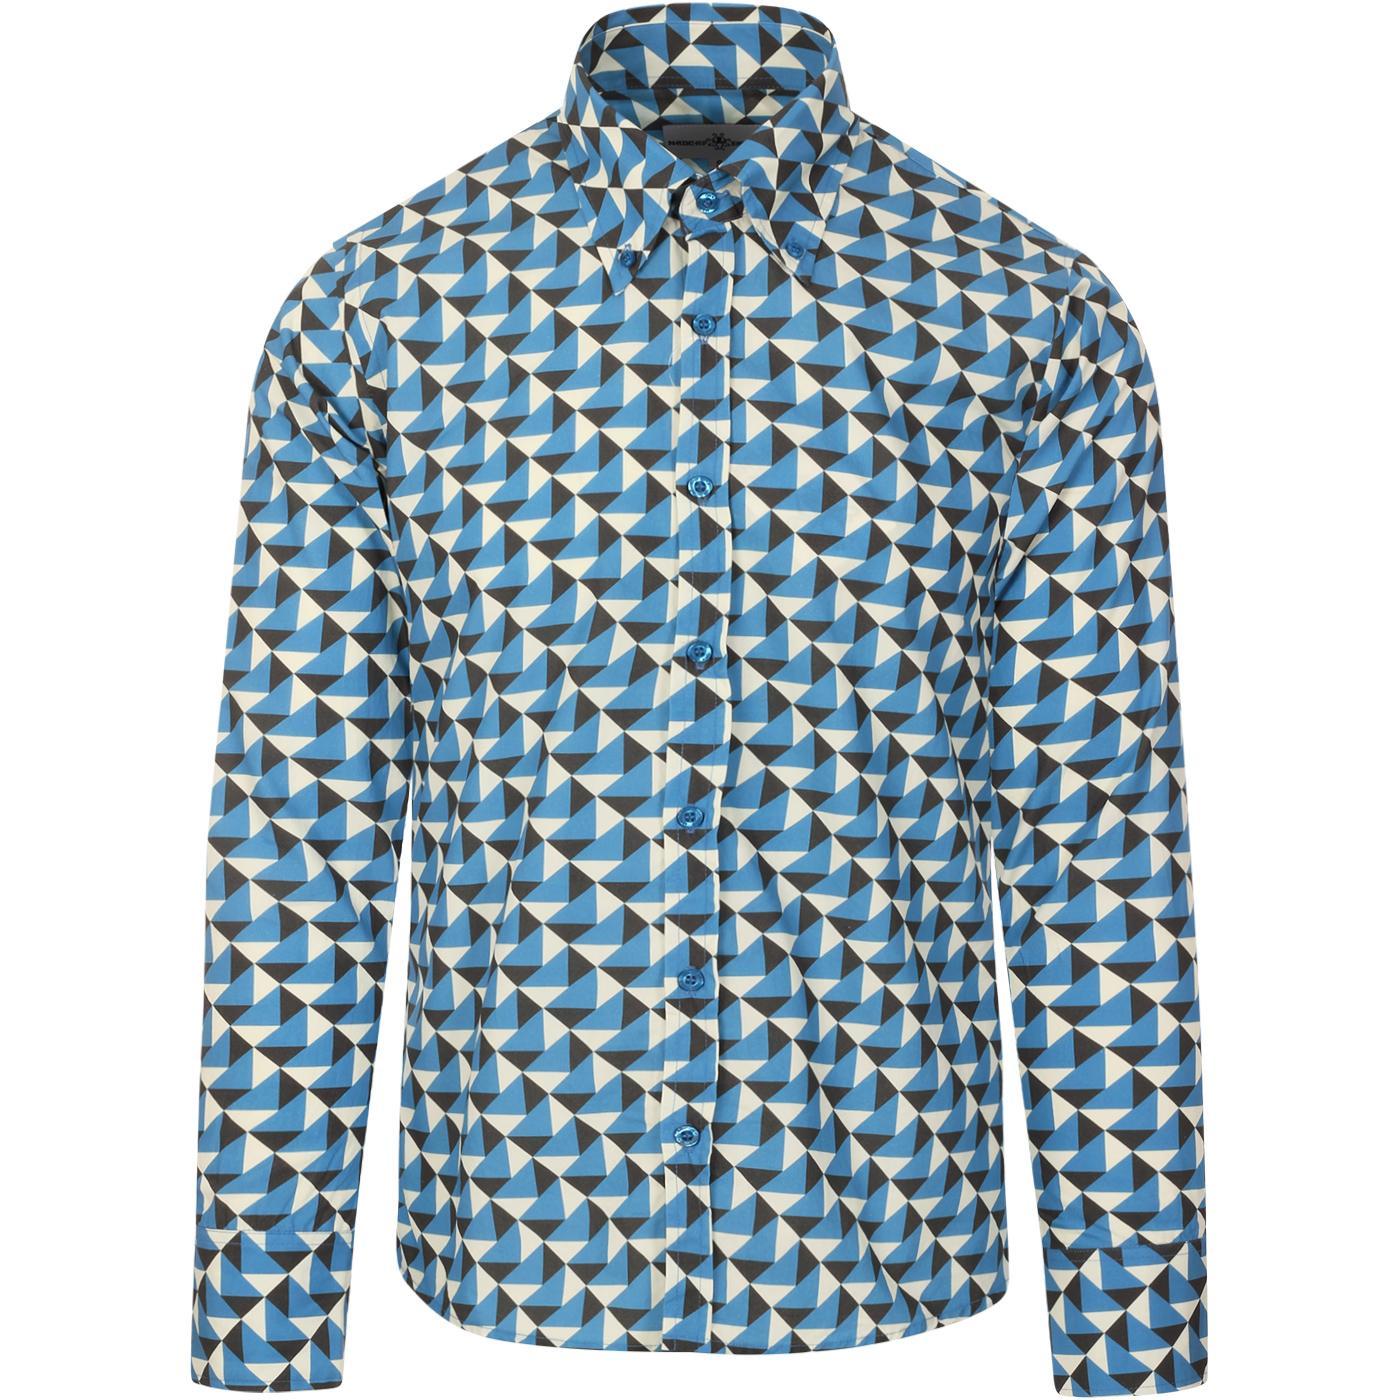 madcap england mens trip geo print long sleeve shirt blue black cream